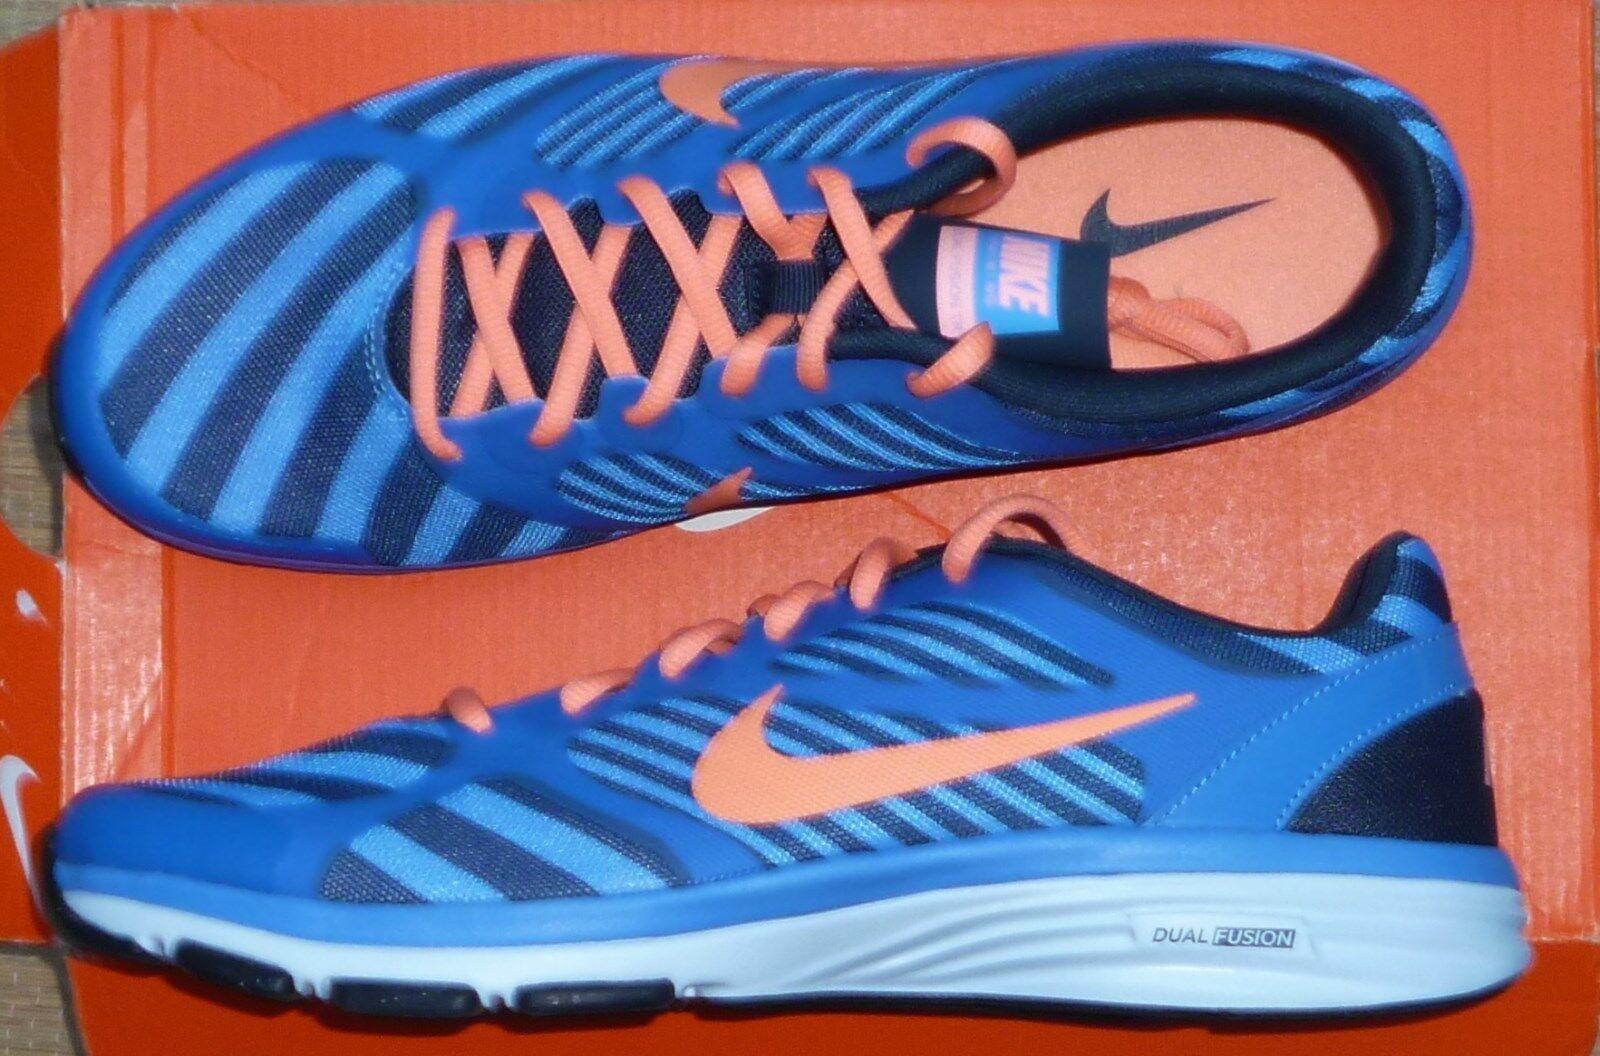 Nike air jordan supernova cp3.vi ae supernova jordan bianco nero gioco royal sport rosso 580580 055 48a501